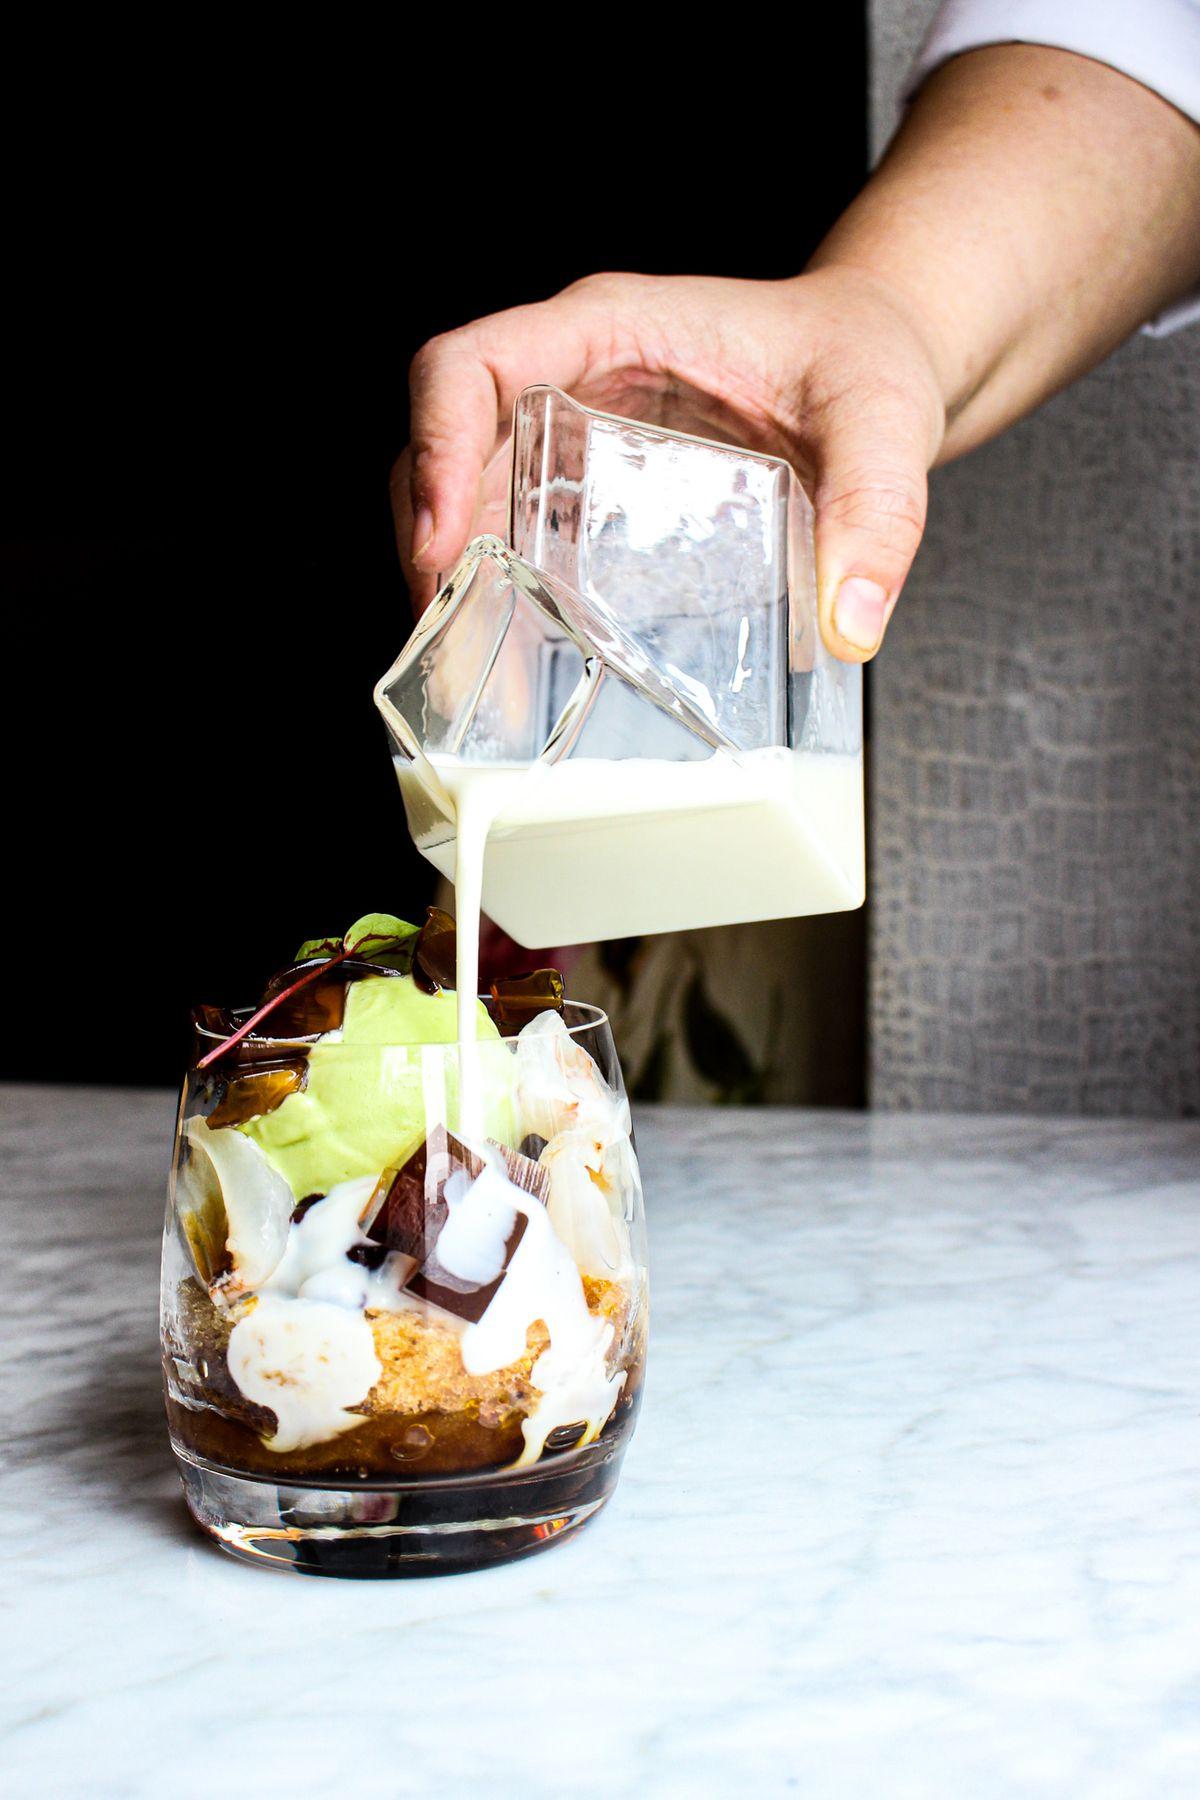 A person pours cream into an upscale riff on a bubble tea.